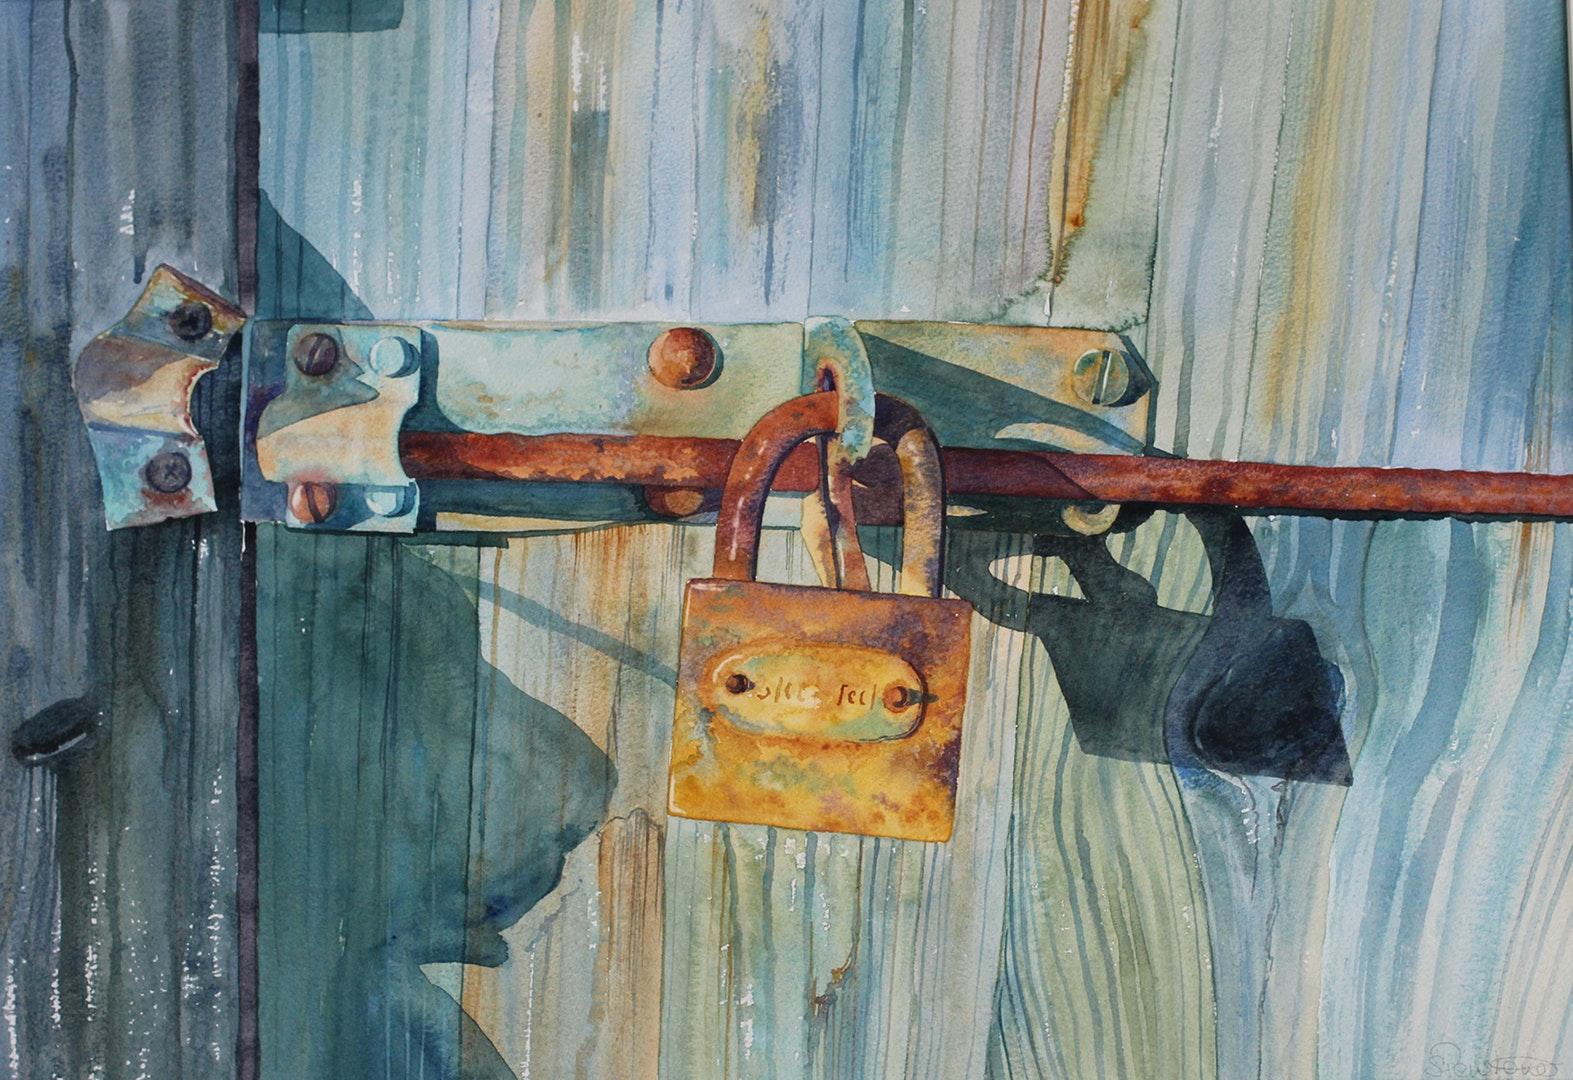 'The Padlock', Sophie Penstone, Watercolour, 42 x 59 cm